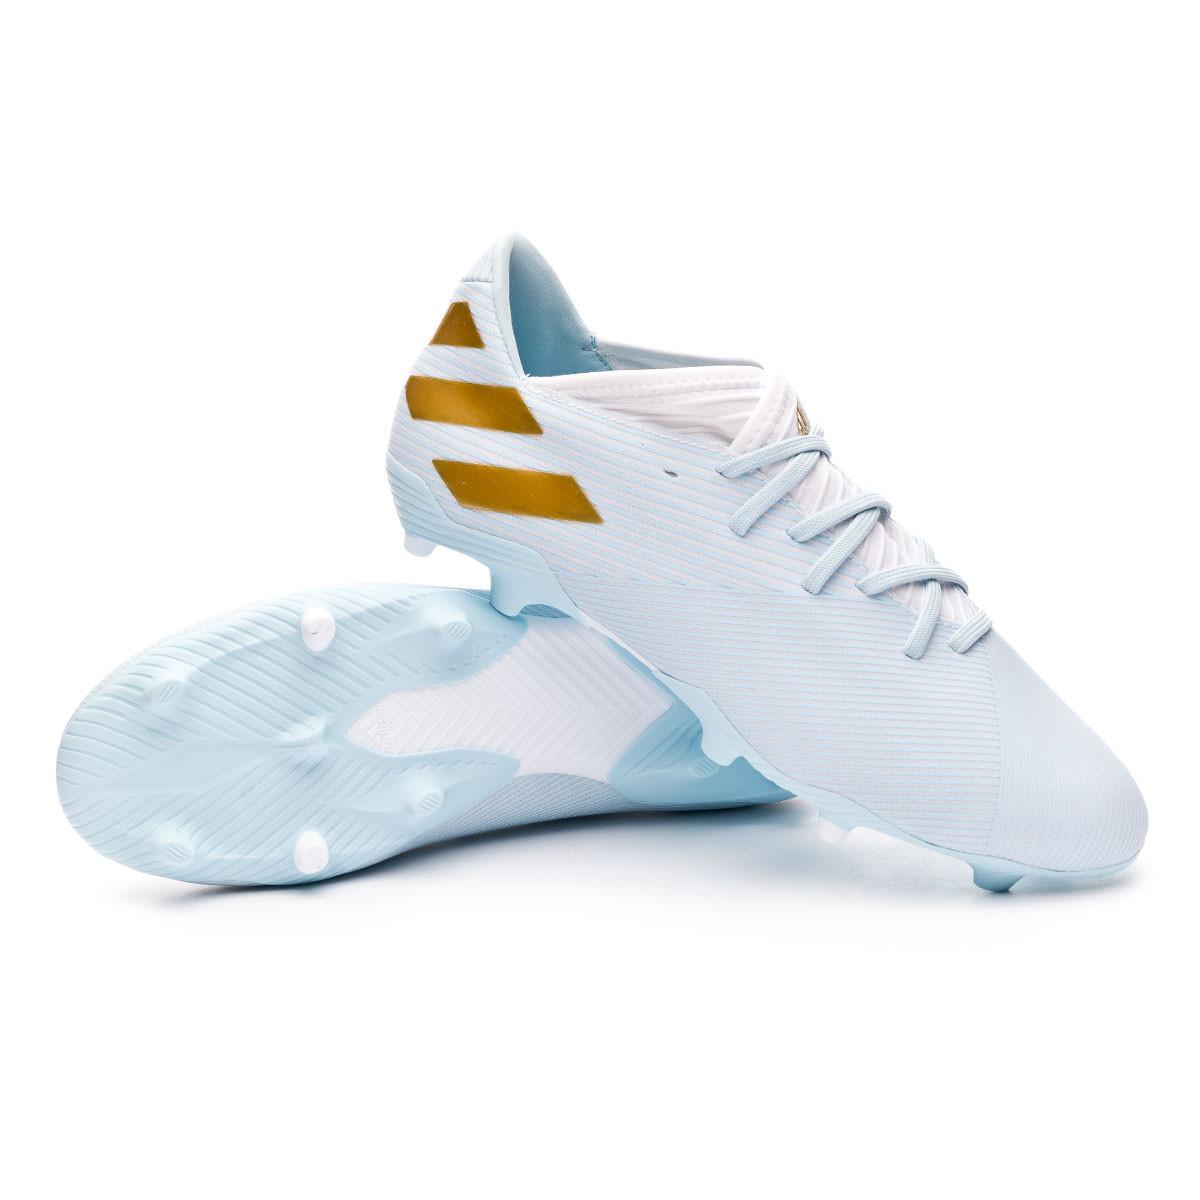 petróleo profundamente vesícula biliar  Football Boots adidas Nemeziz Messi 19.3 FG 15 Years Boaqua-Gold metallic -  Football store Fútbol Emotion